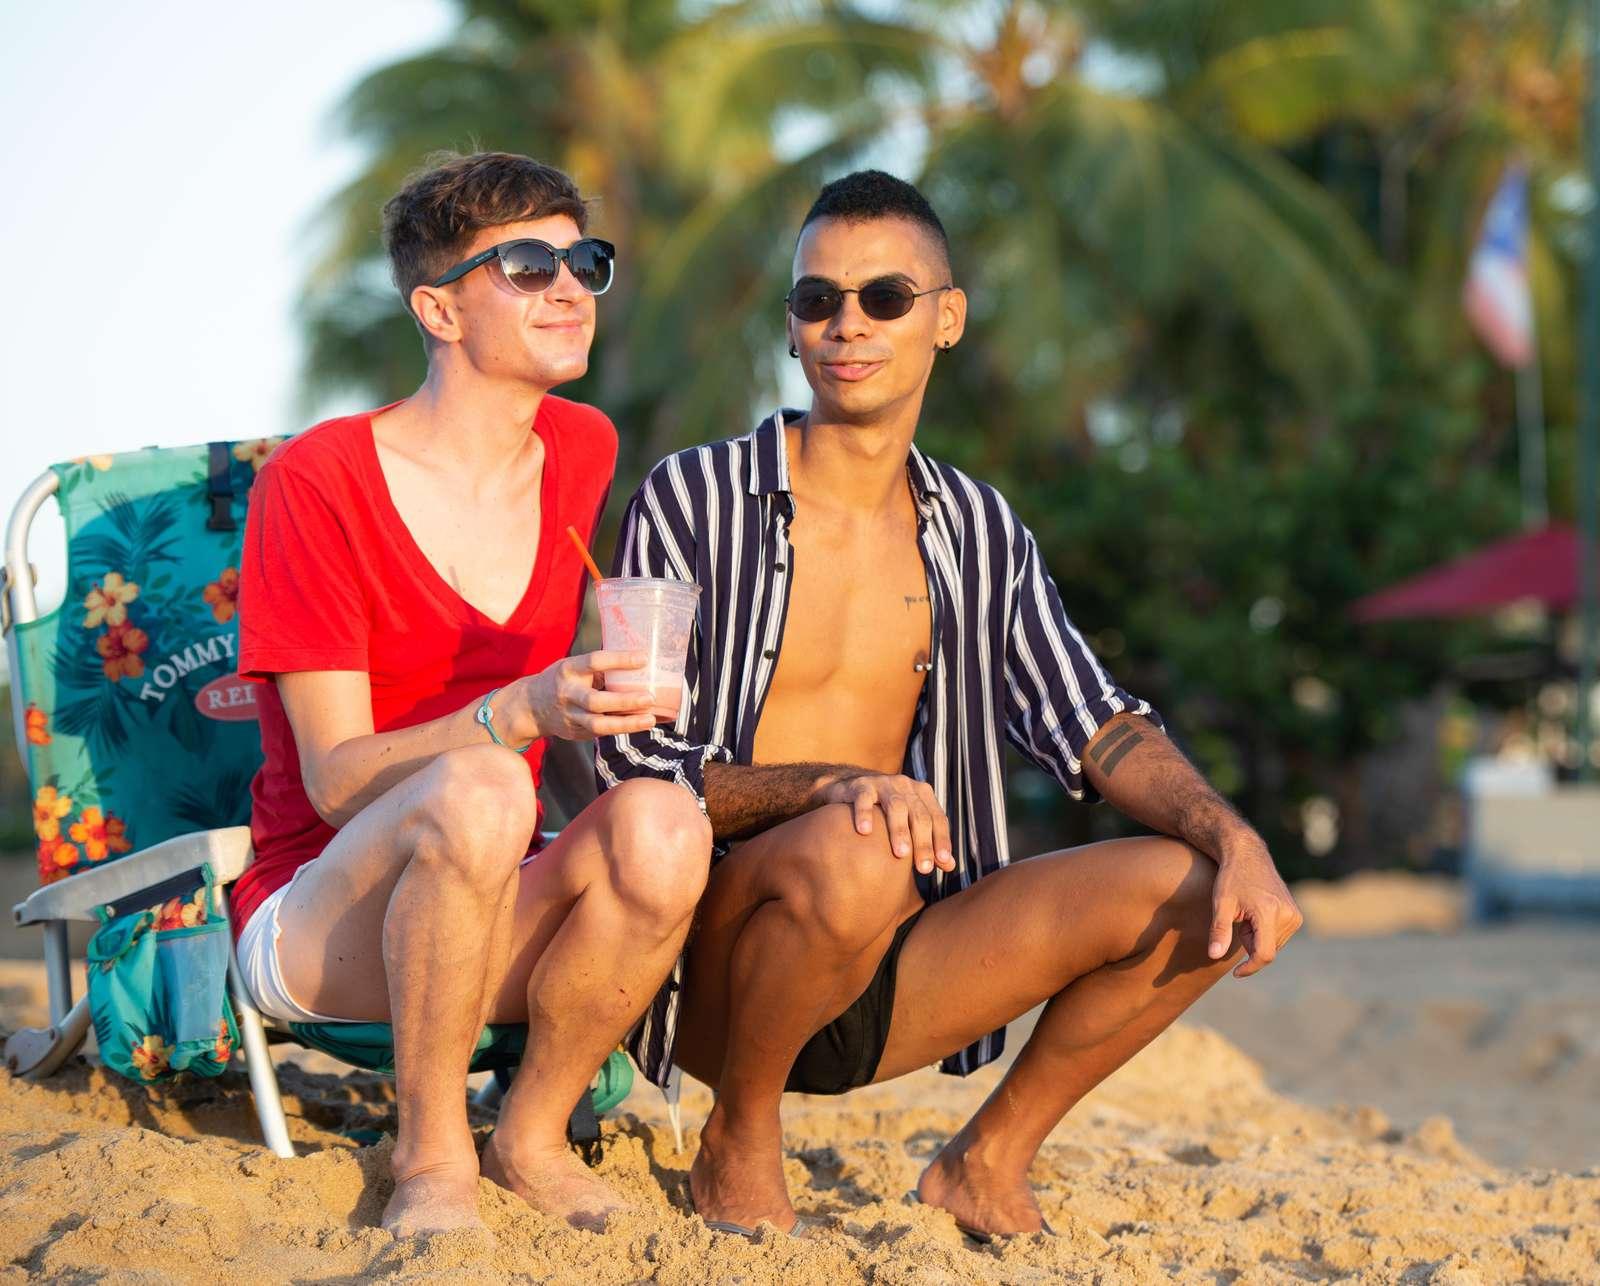 Gay friendly Ocean Park beach is a one minute walk